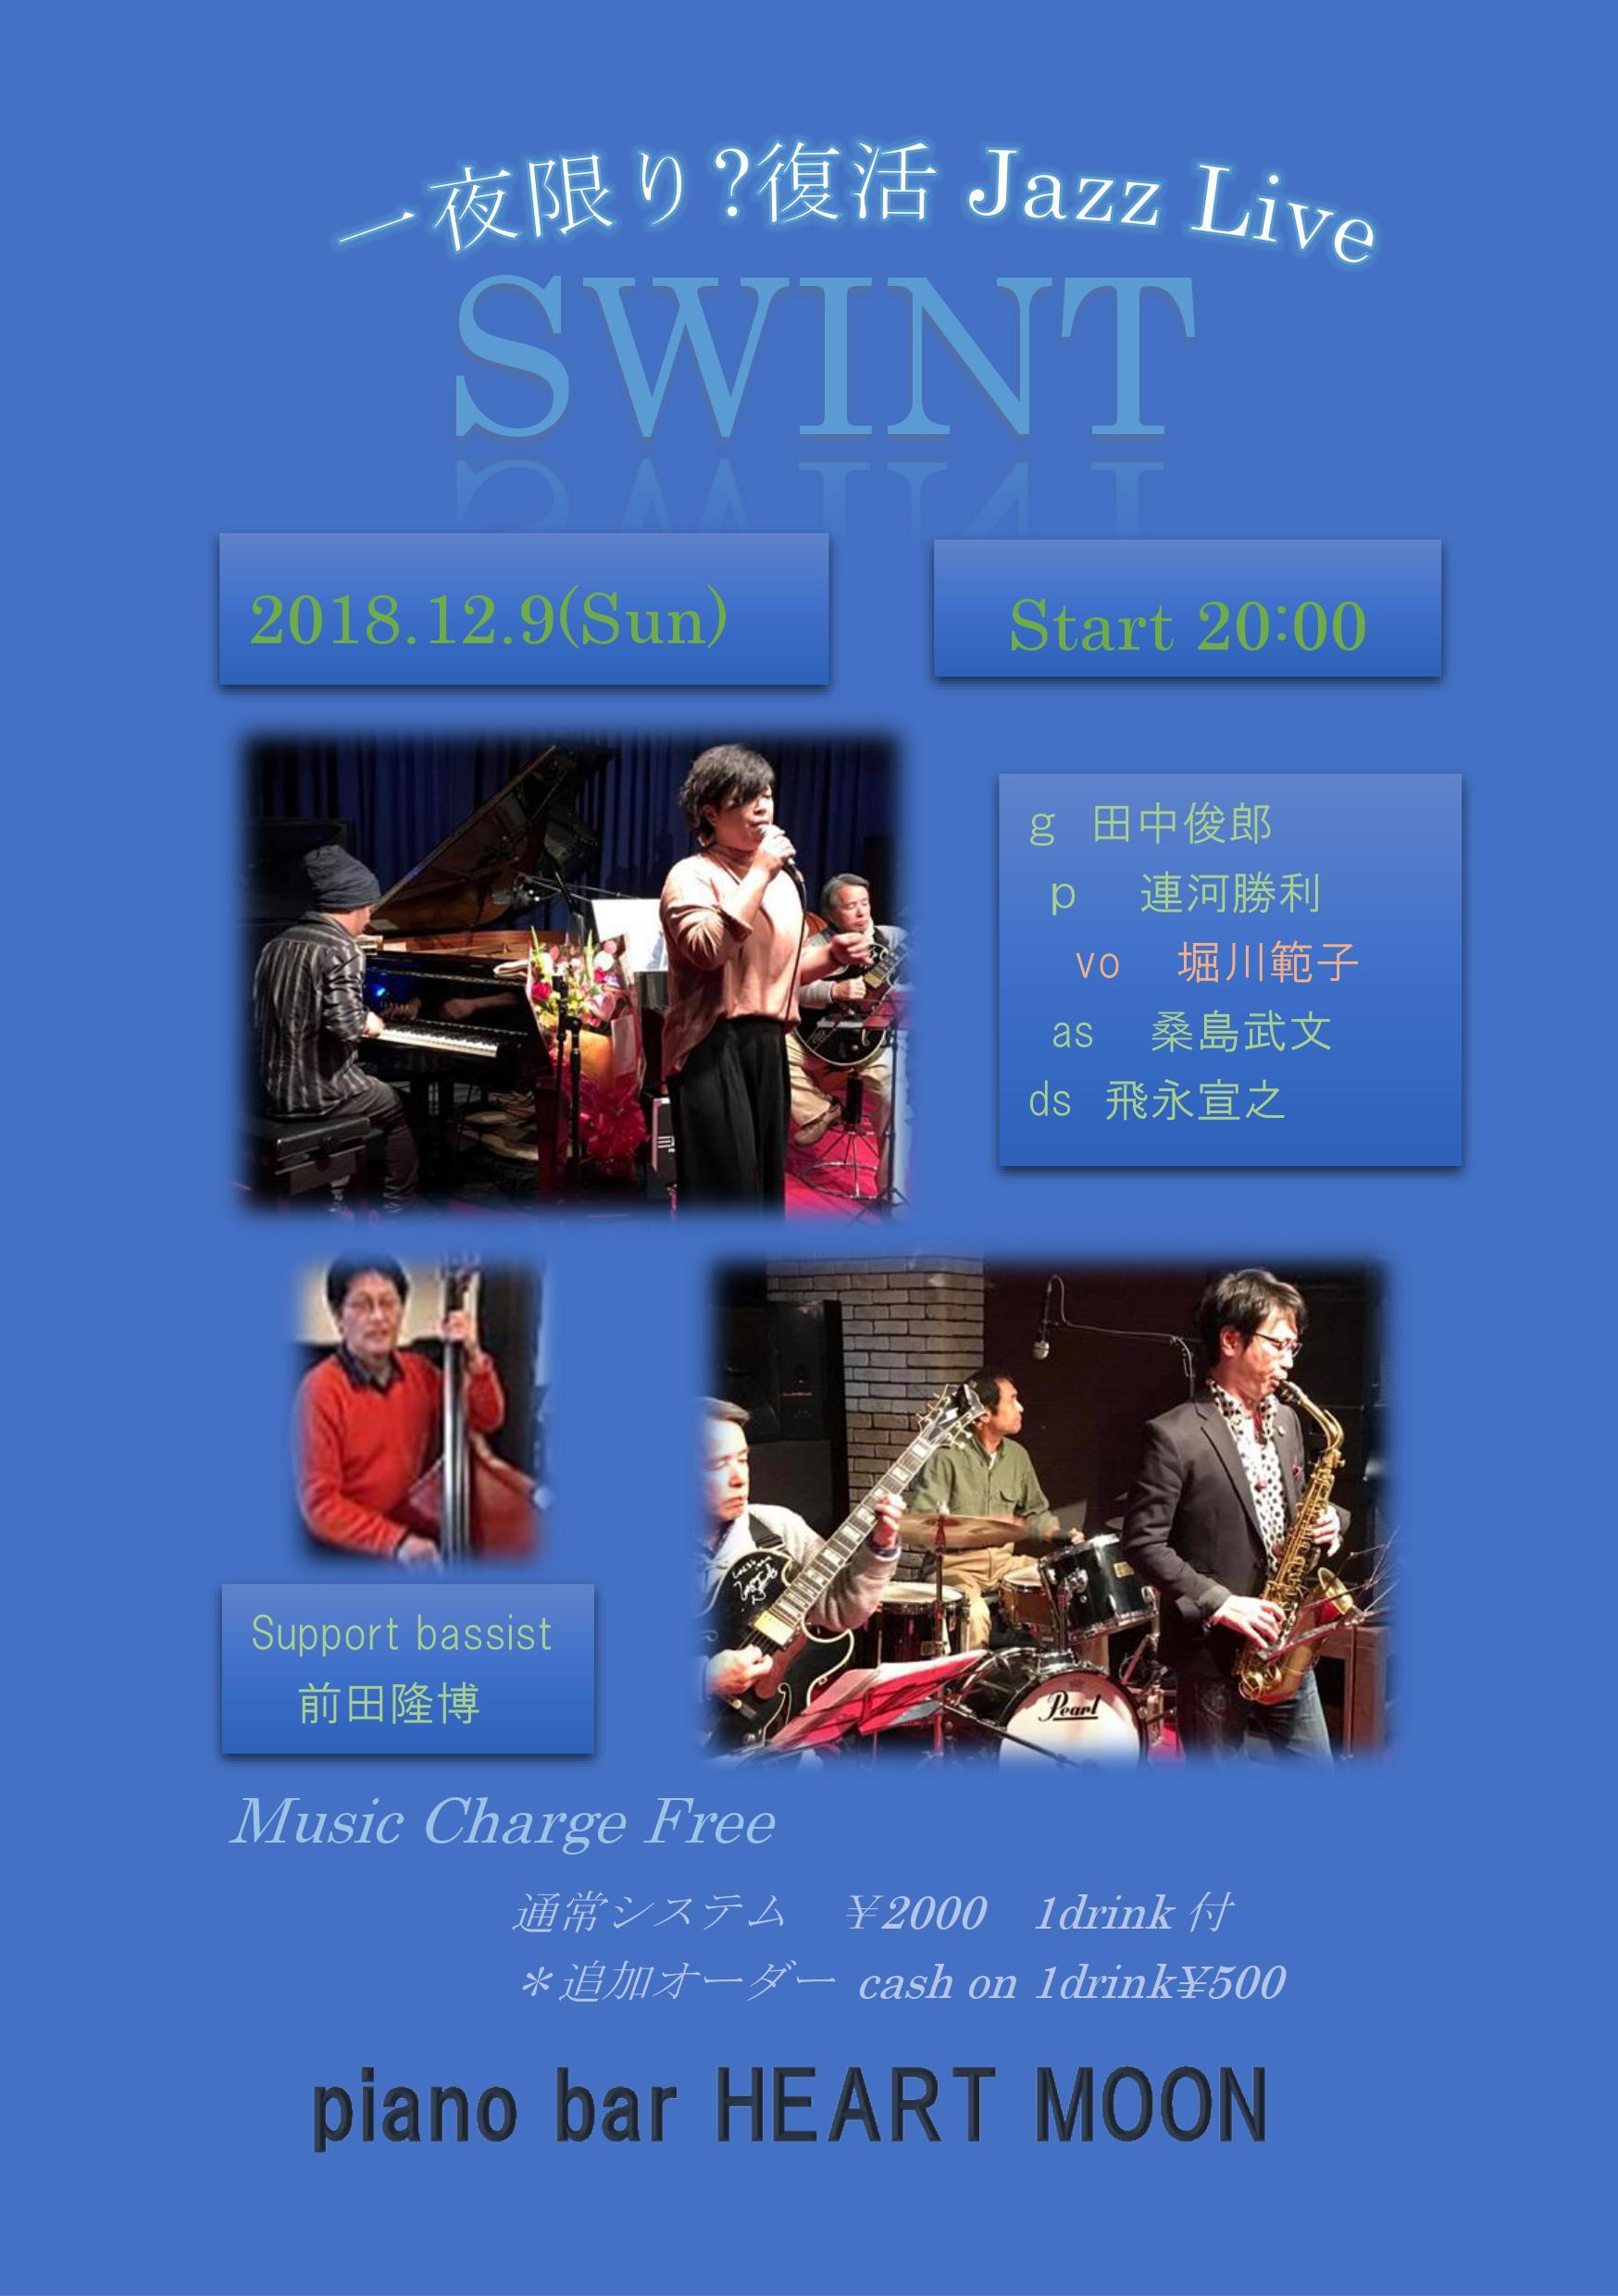 一夜限り?復活 Jazz Live|swint